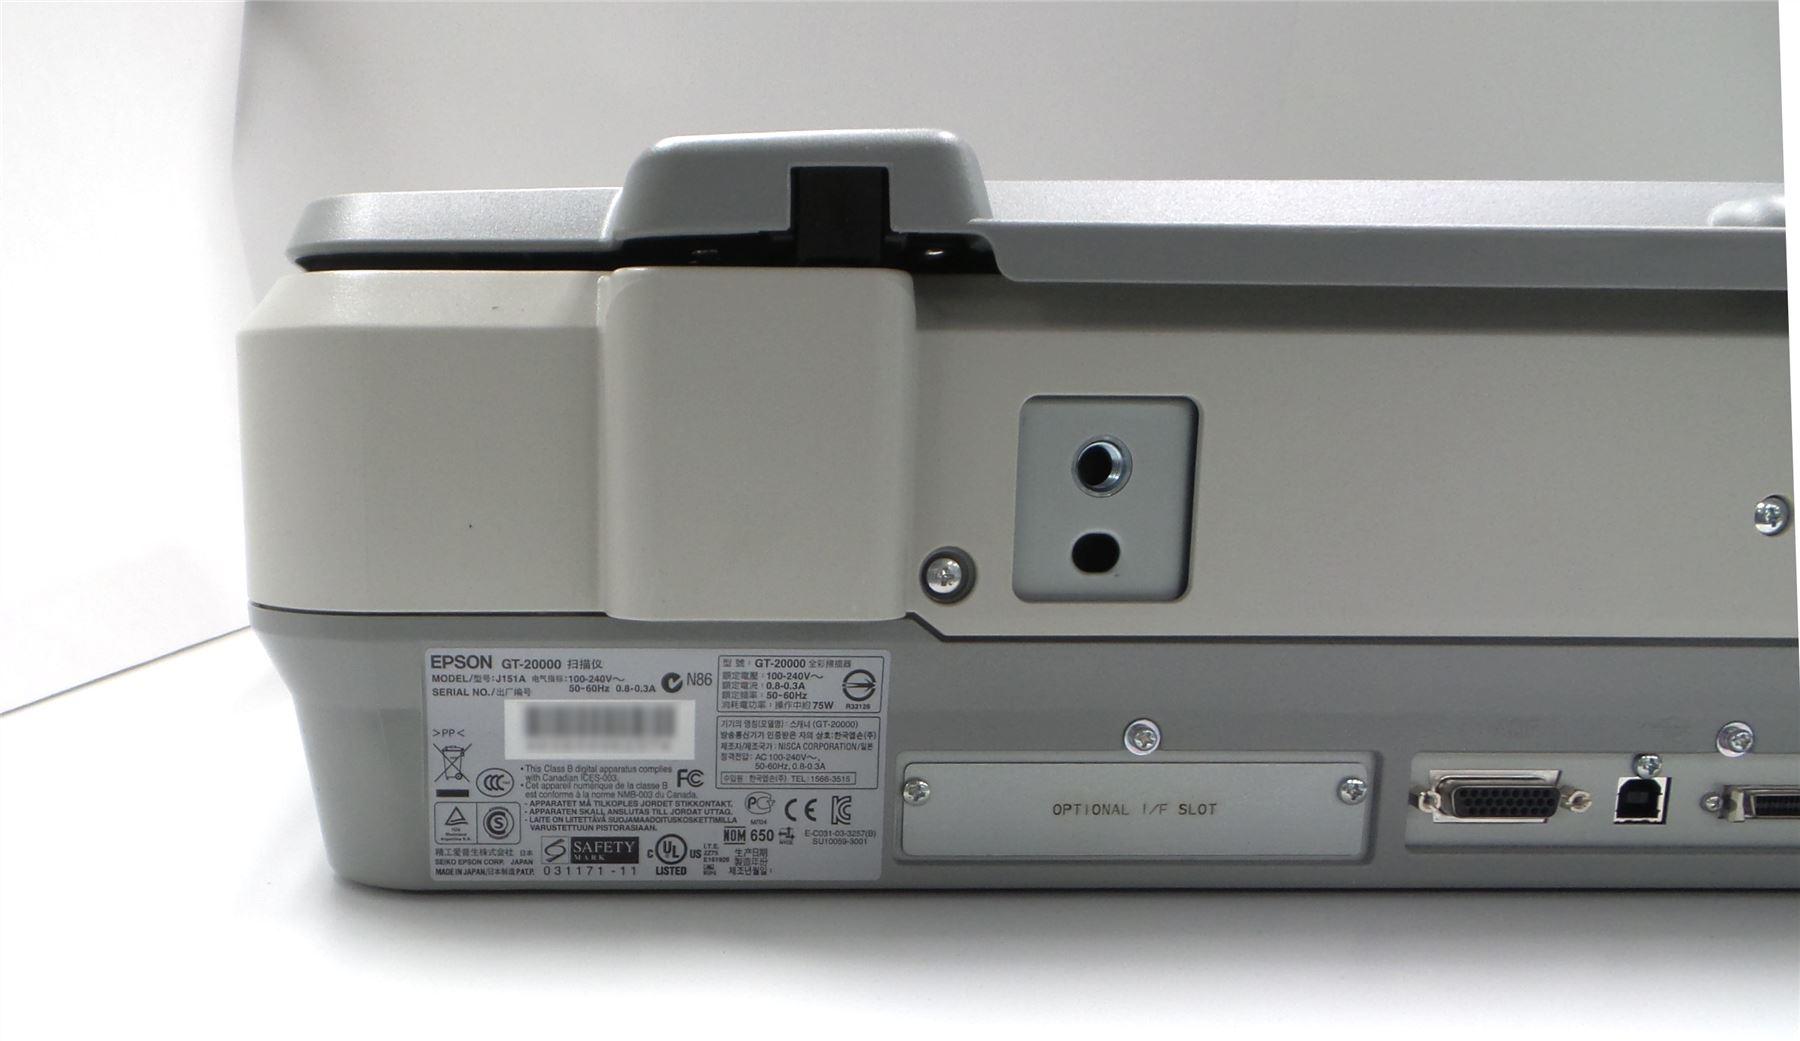 Details about Epson GT-20000 Flatbed Scanner A3 Large Format 48 Bit Color